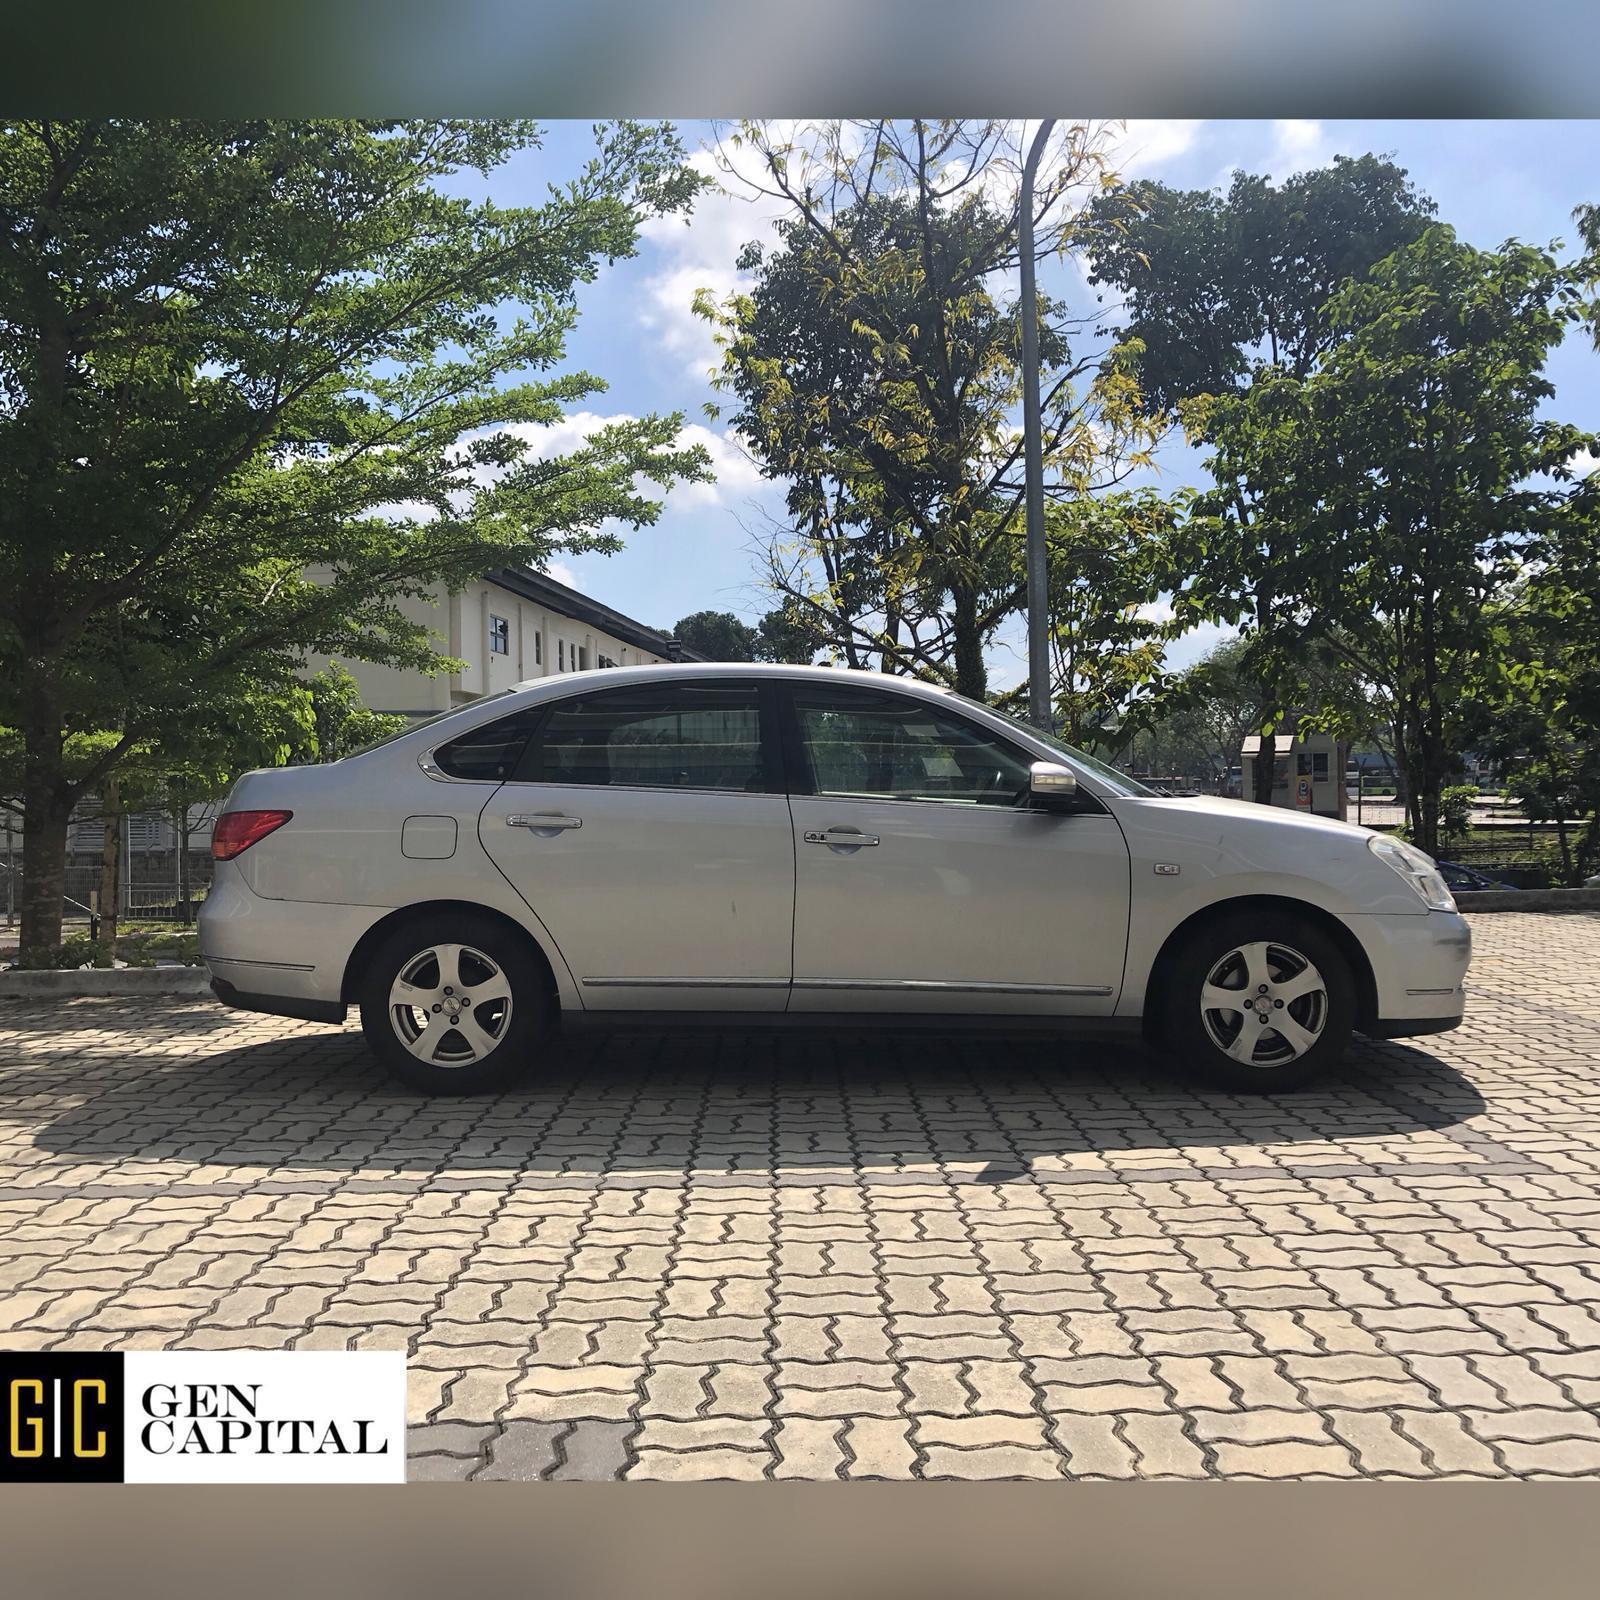 Nissan sylphy 1.5A Affordable Rental Car Svs, Grab Gojek Ryde Tada & Non PHV